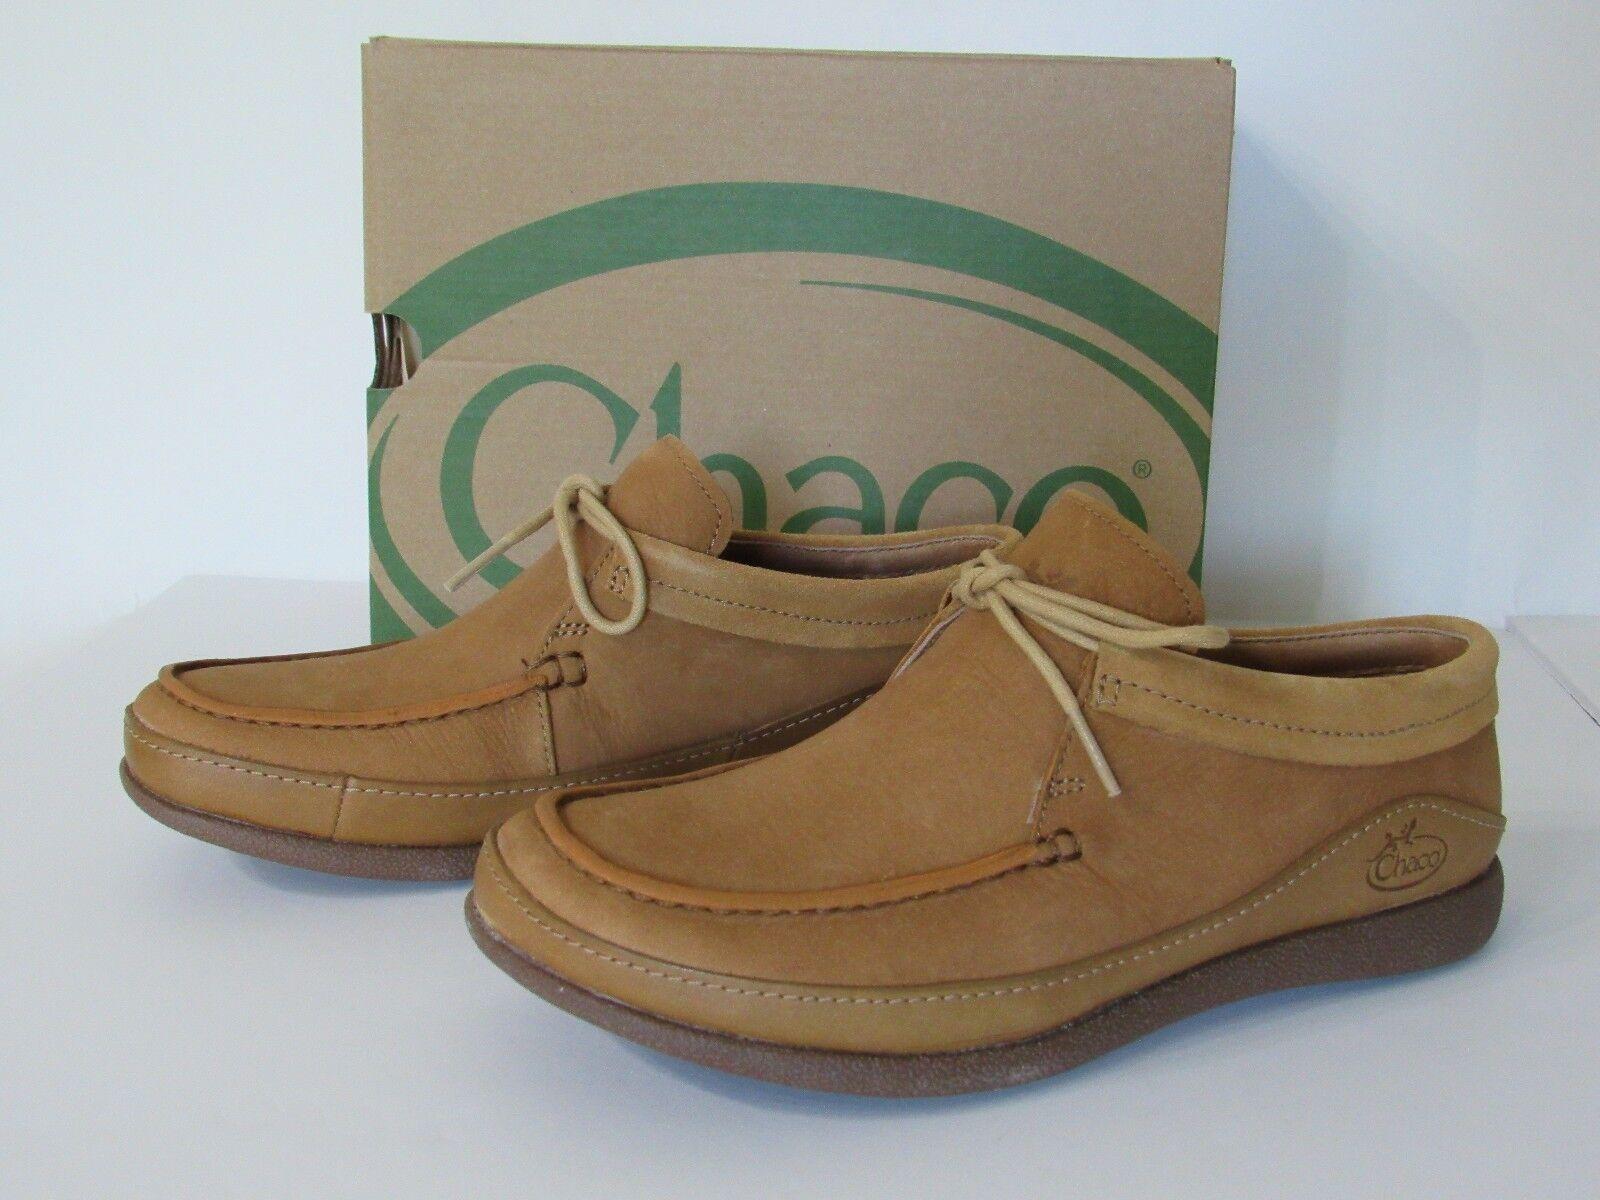 Chaco Pineland LUVSEAT damen Tan Tan Tan Leather Lace Up Comfort schuhe Größe 6.5 NEW 7ee0bb